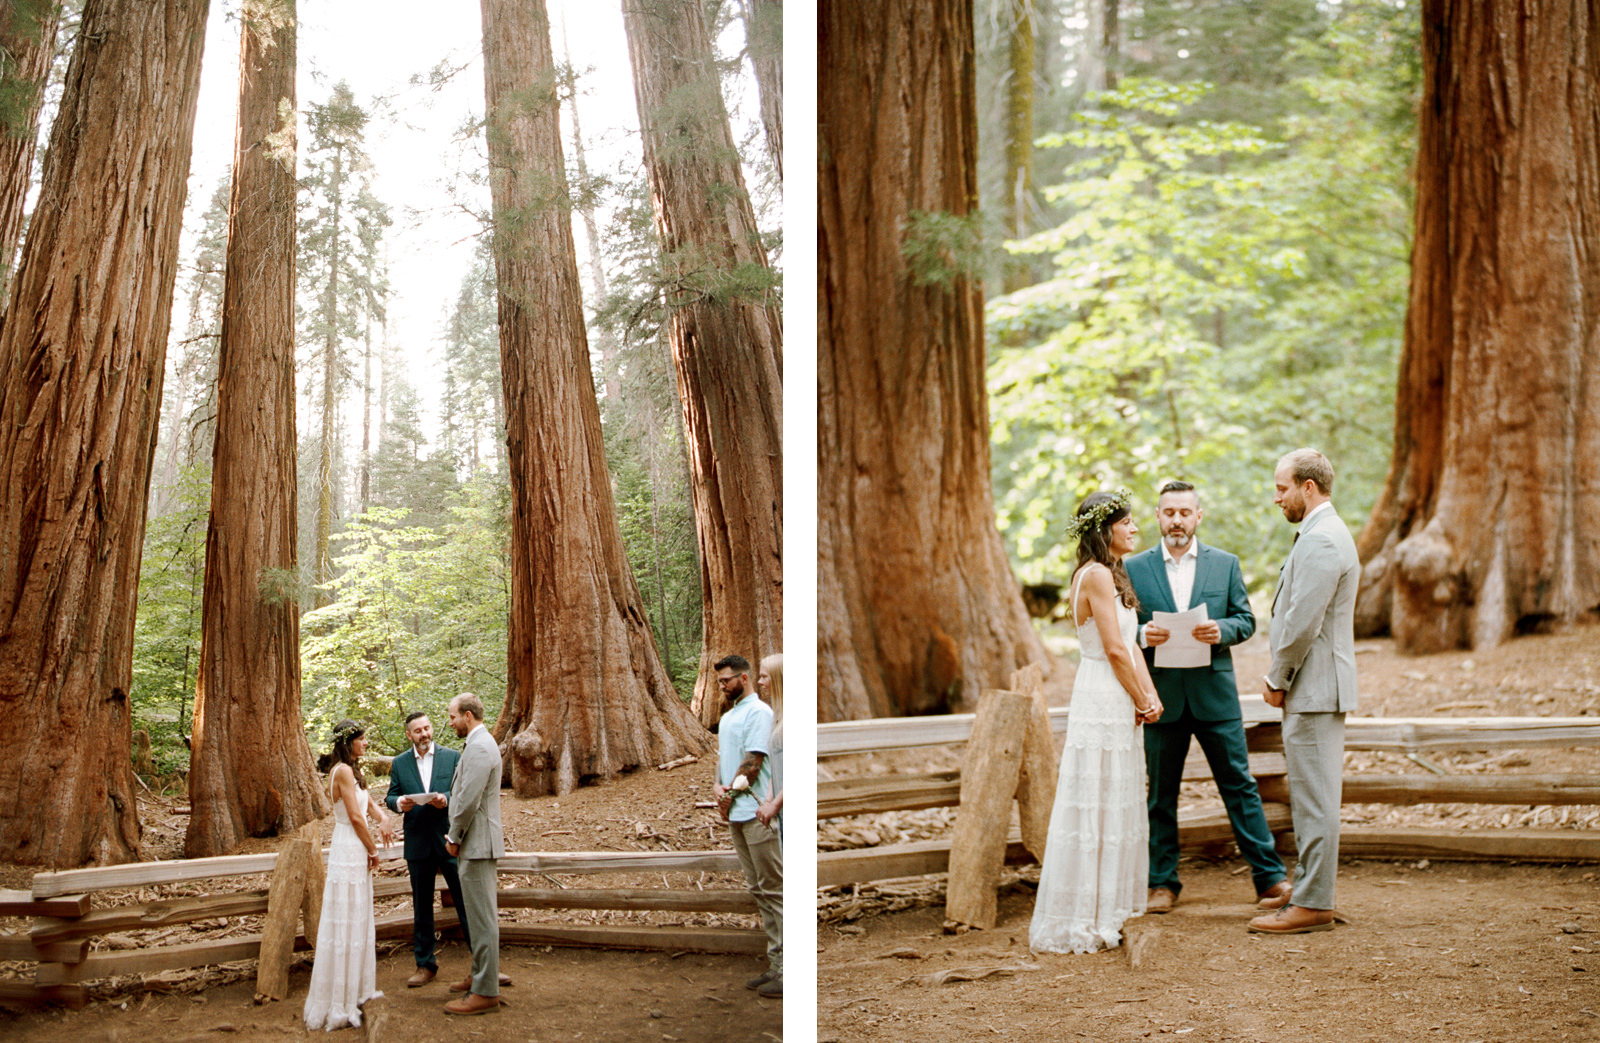 yosemite-intimate-wedding-053 YOSEMITE INTIMATE WEDDING